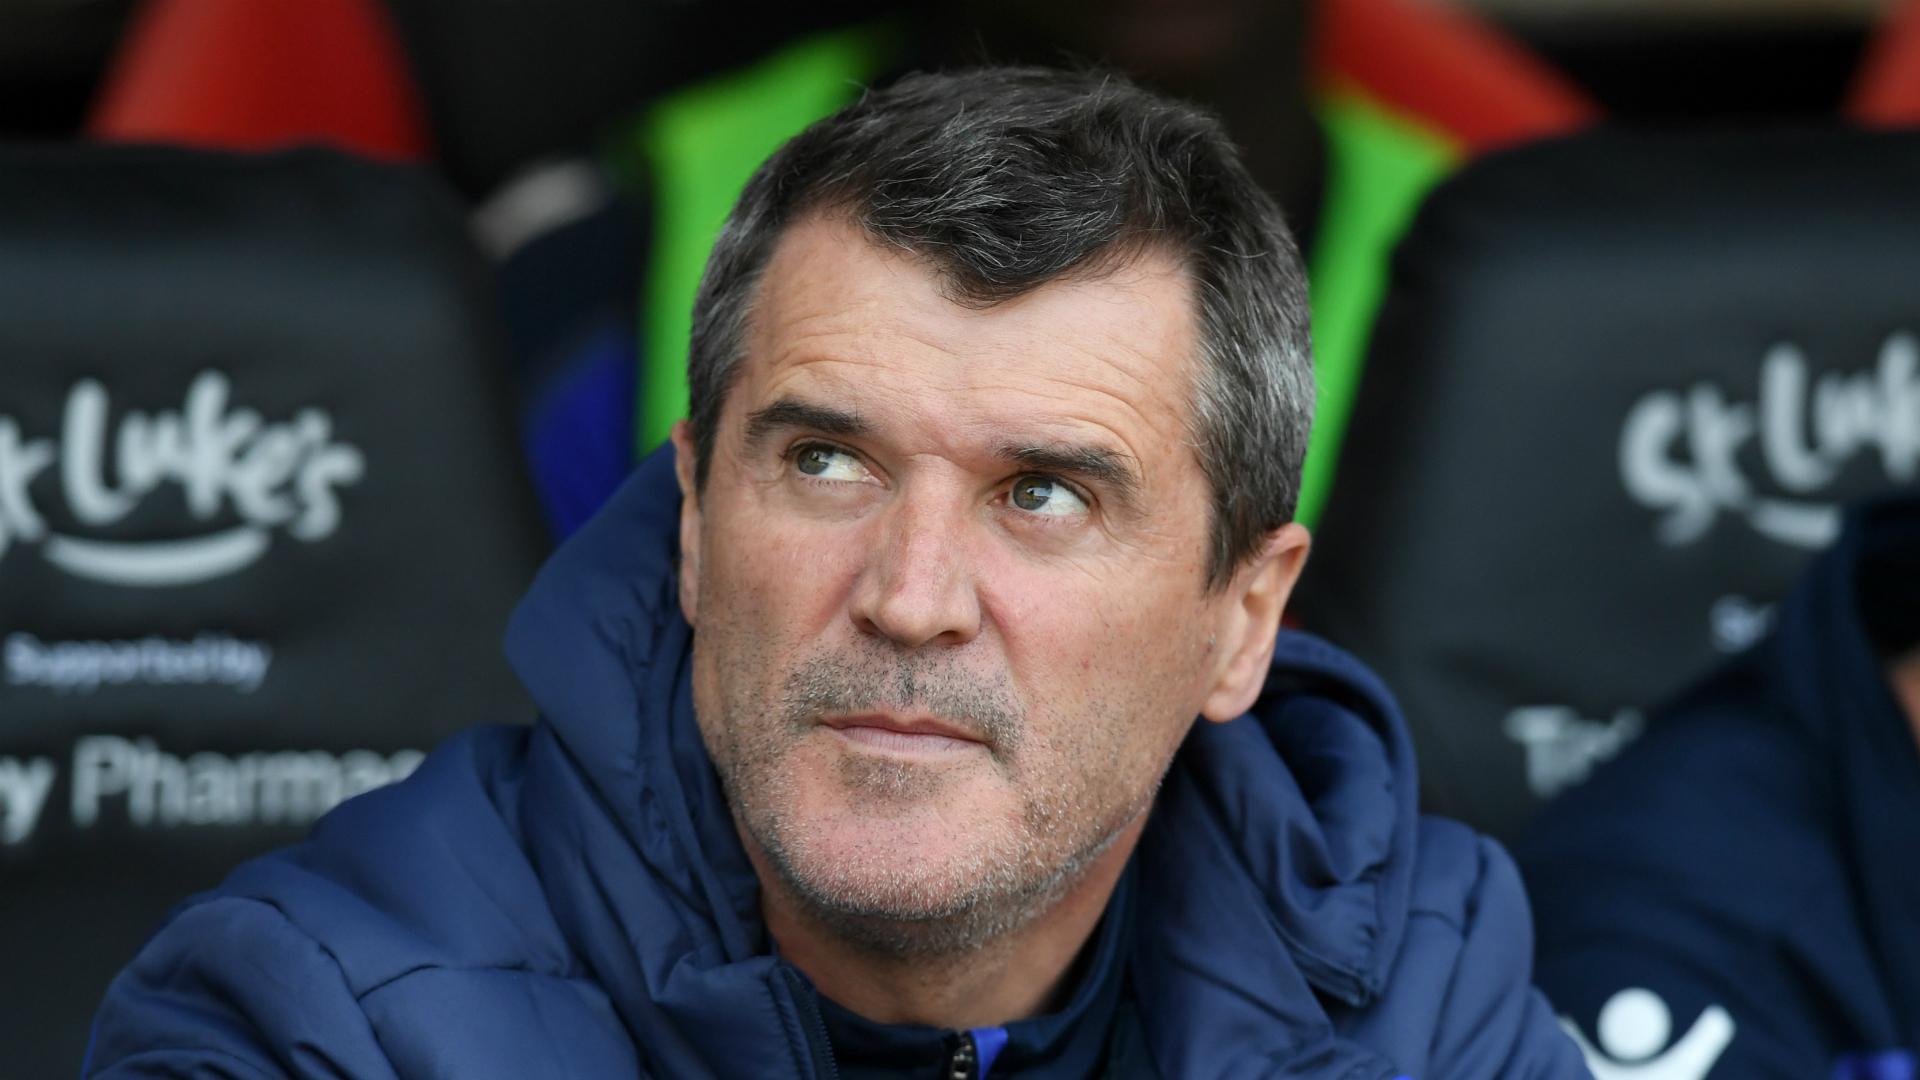 Man Utd legend Keane quits Nottingham Forest role after just five months